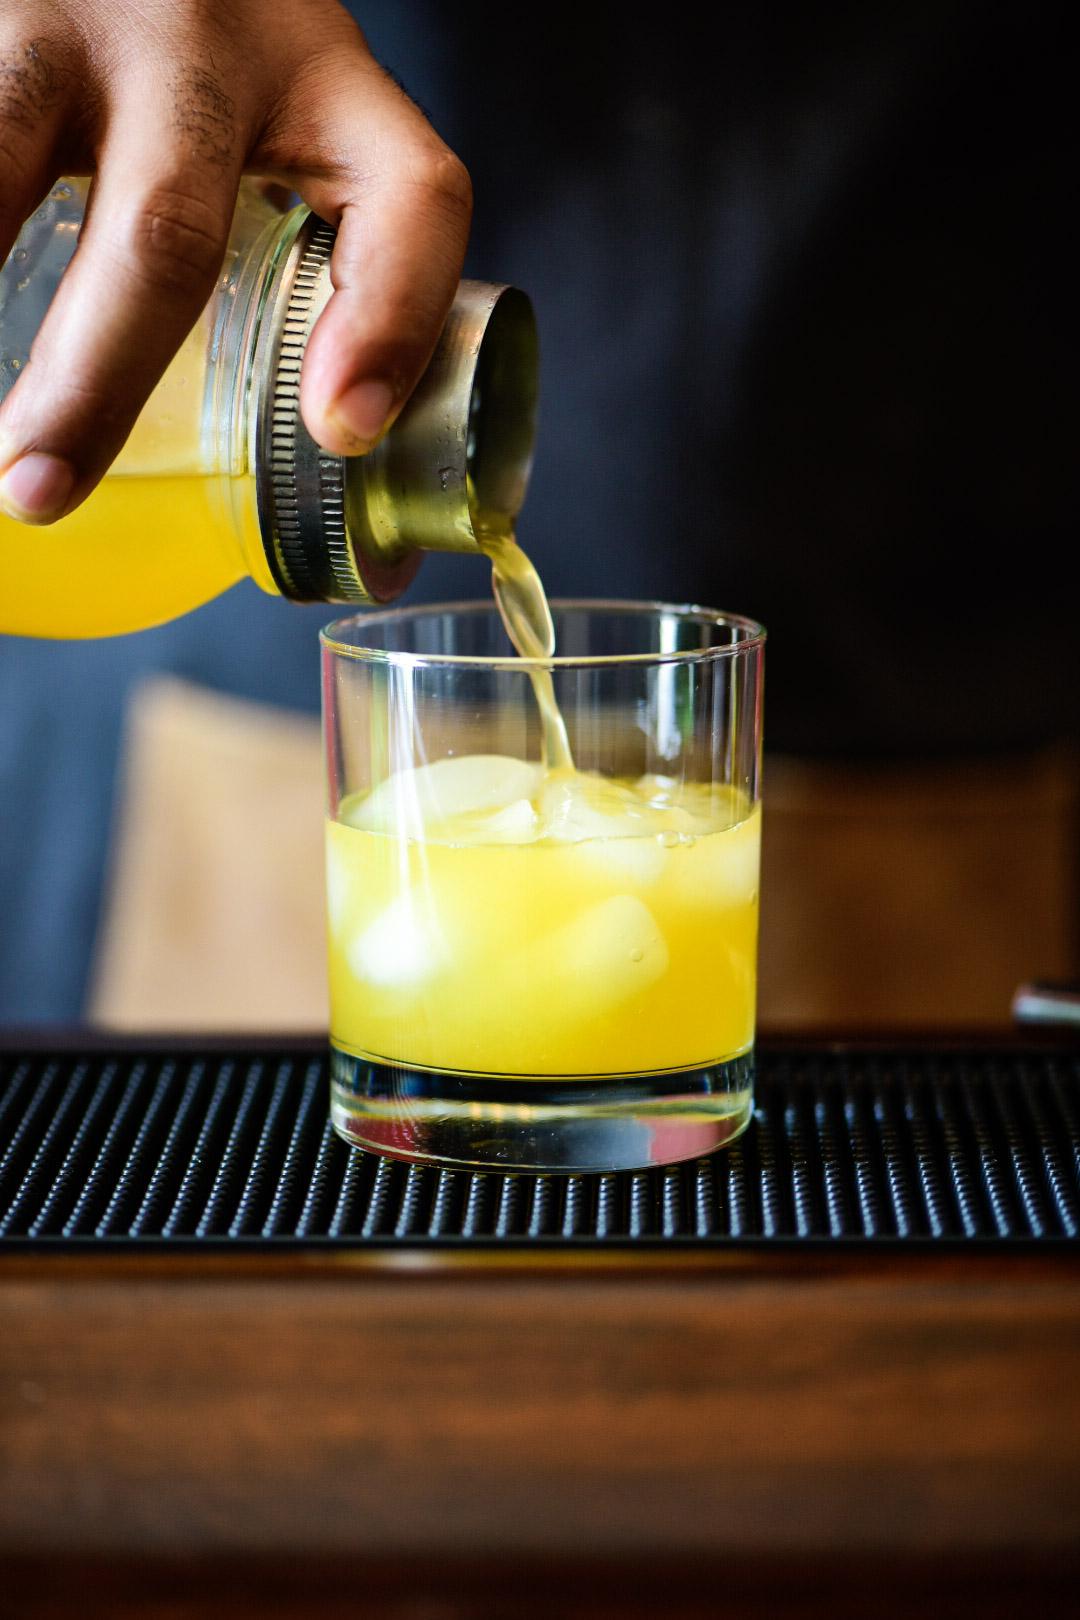 pouring shaken cocktail in iced glass for Mandarin Orange Crush Cocktail